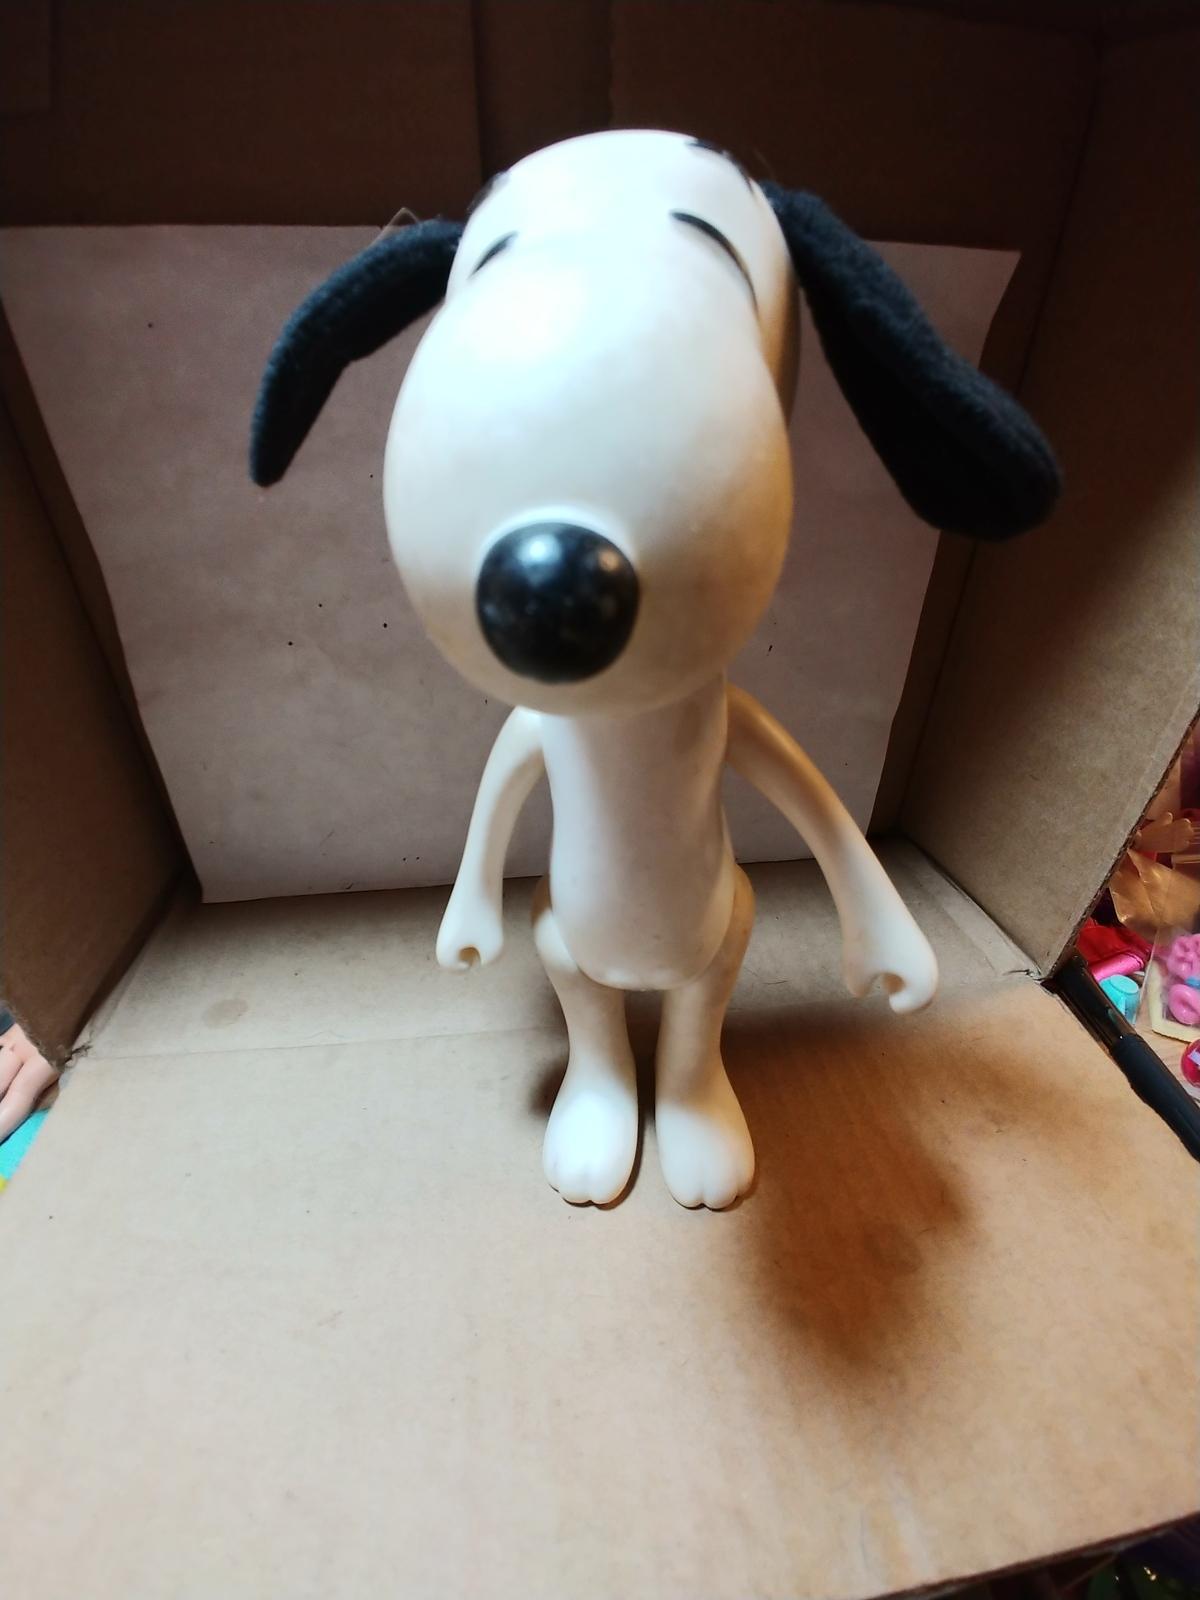 "Vintage Snoopy 1966 Plastic United Syndicate Knickerbocker Toy 8""  - $8.00"